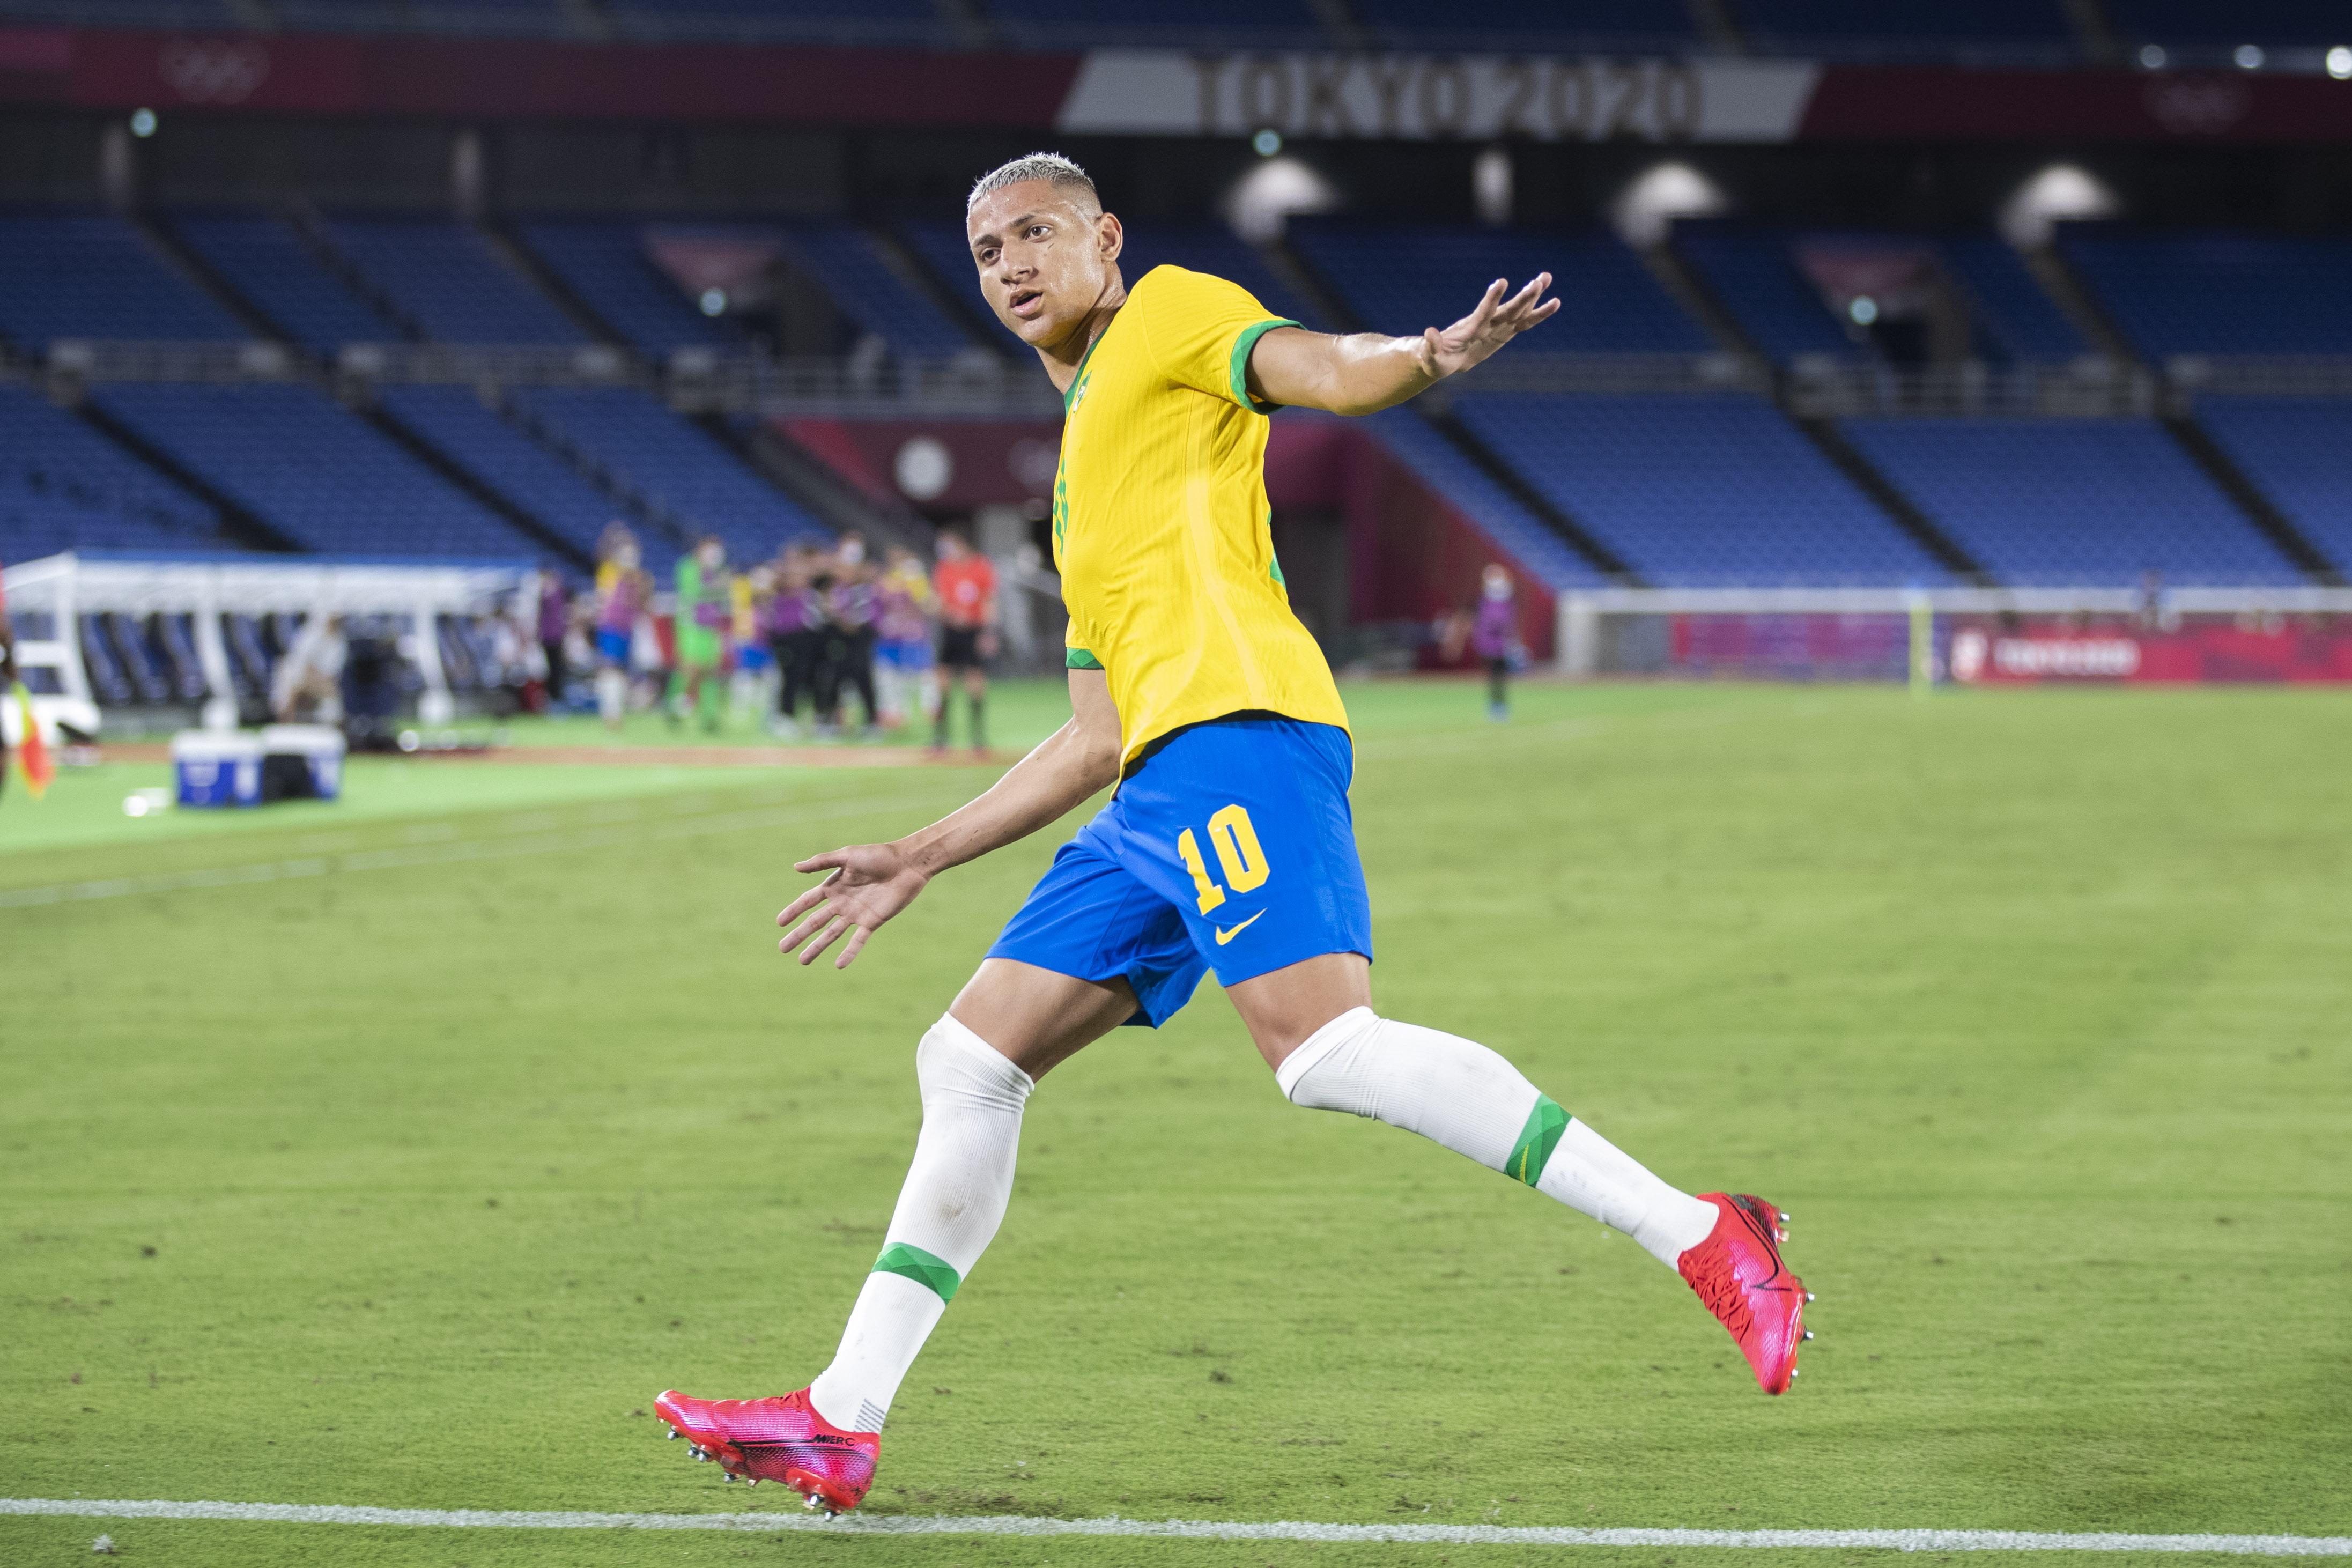 Brazil v Germany - Men's Football - Olympics Day -1